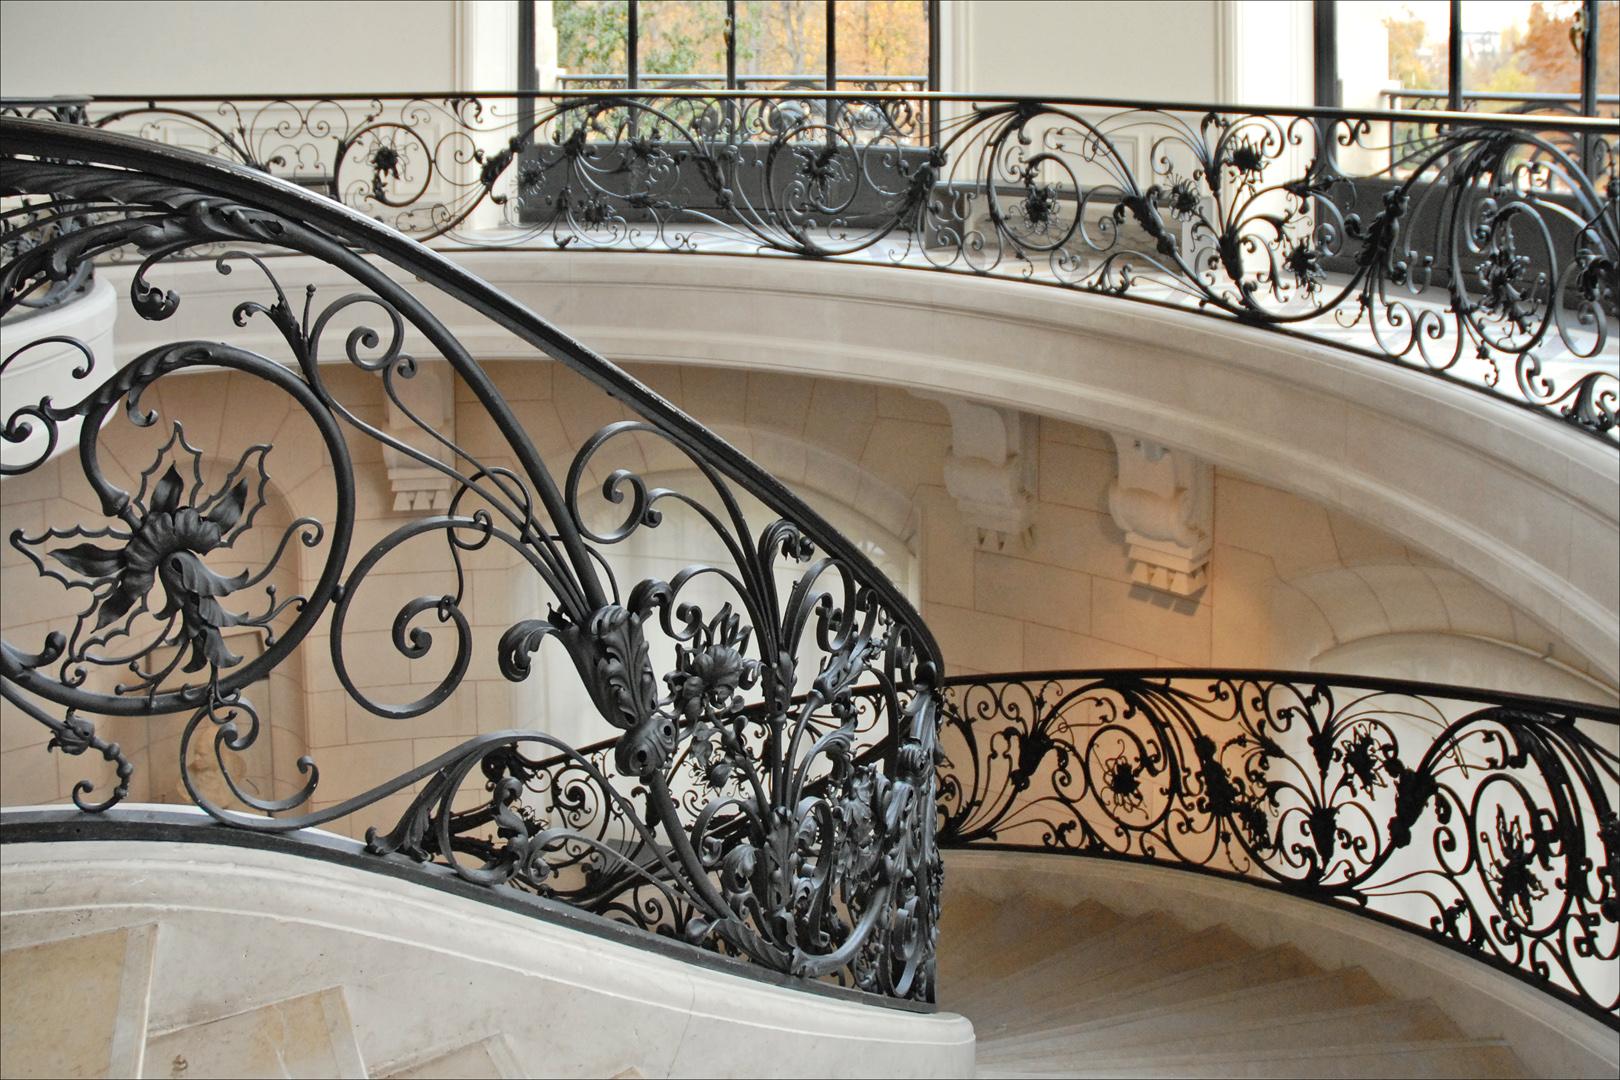 file rampe en fer forg dune des rotondes du petit palais 5172249040 jpg wikimedia commons. Black Bedroom Furniture Sets. Home Design Ideas